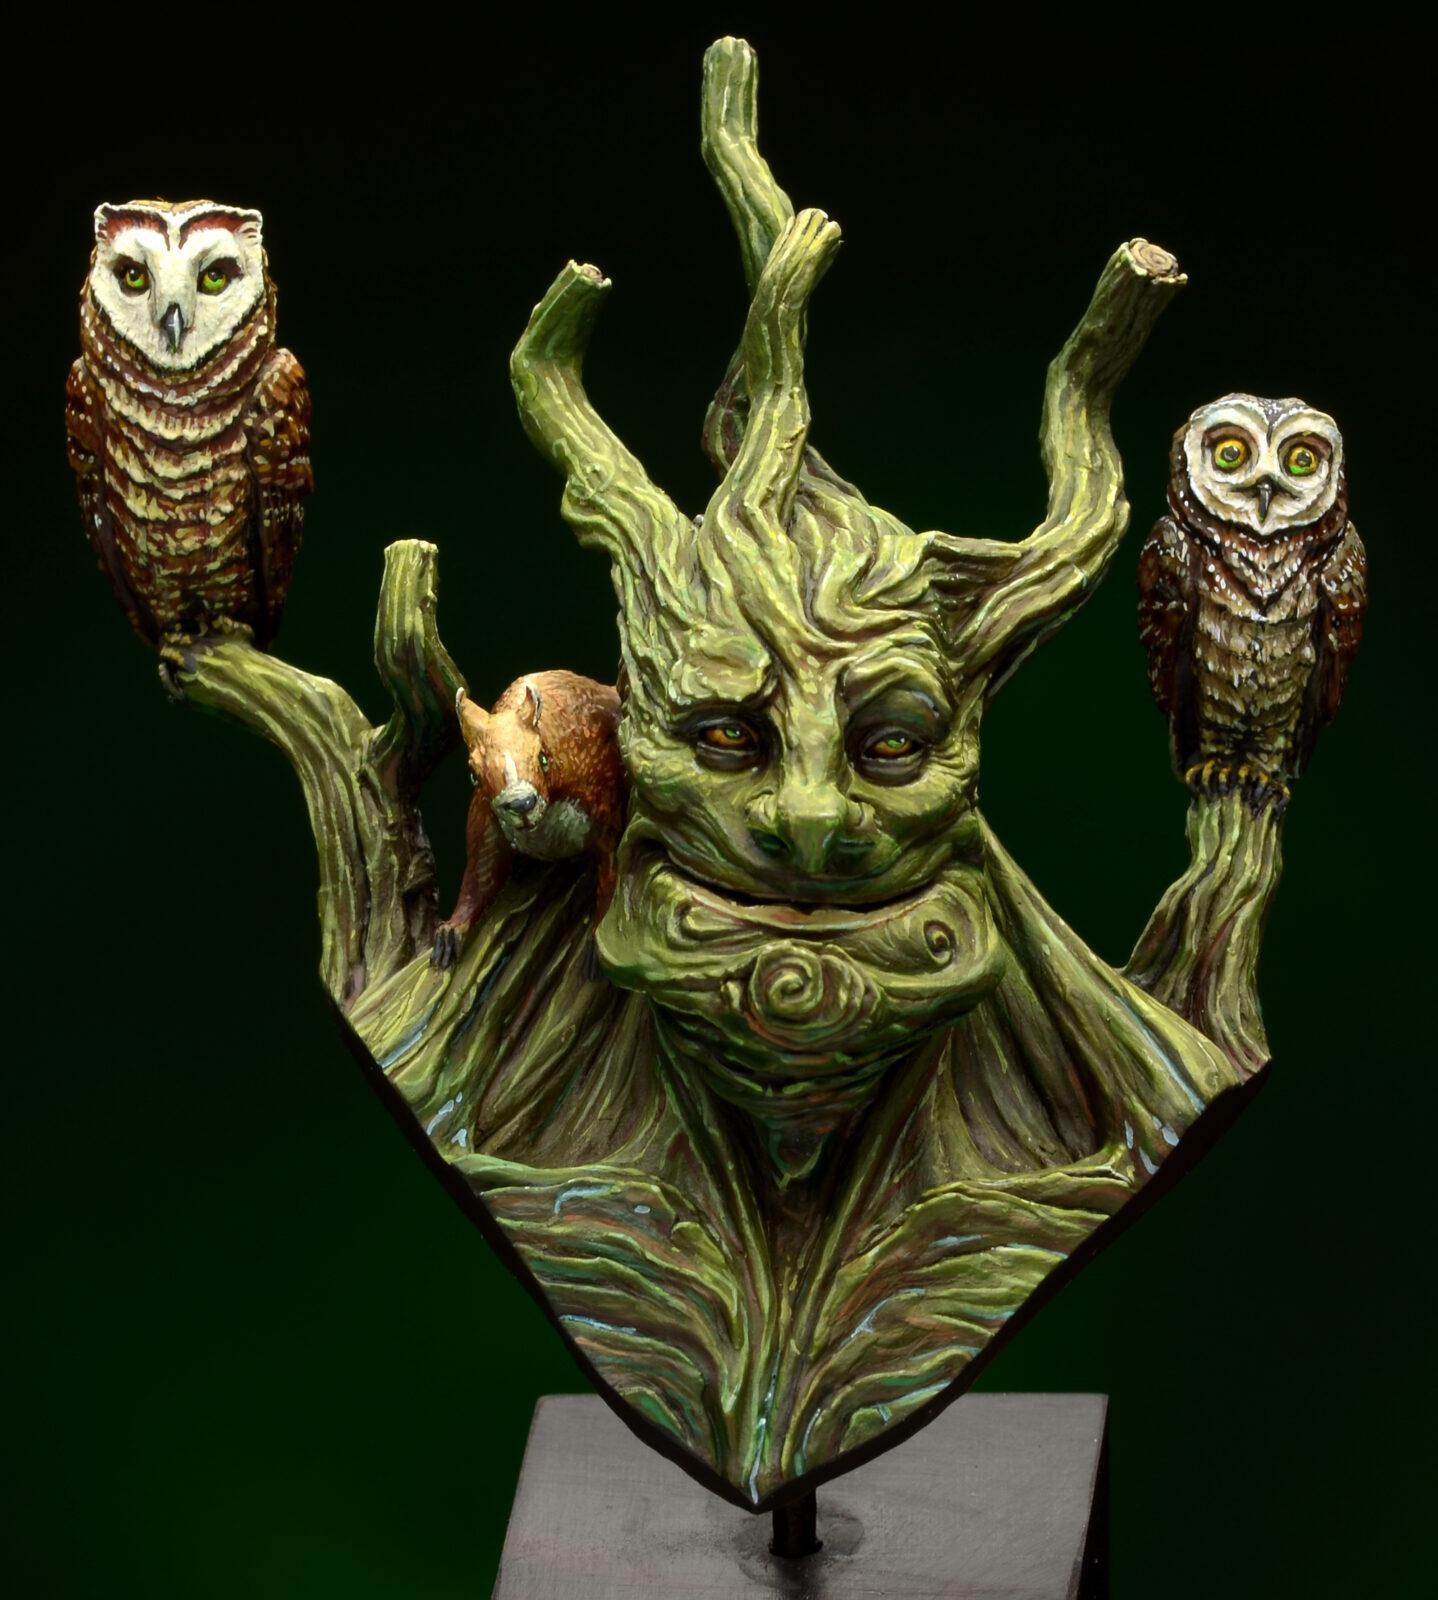 Treeman45